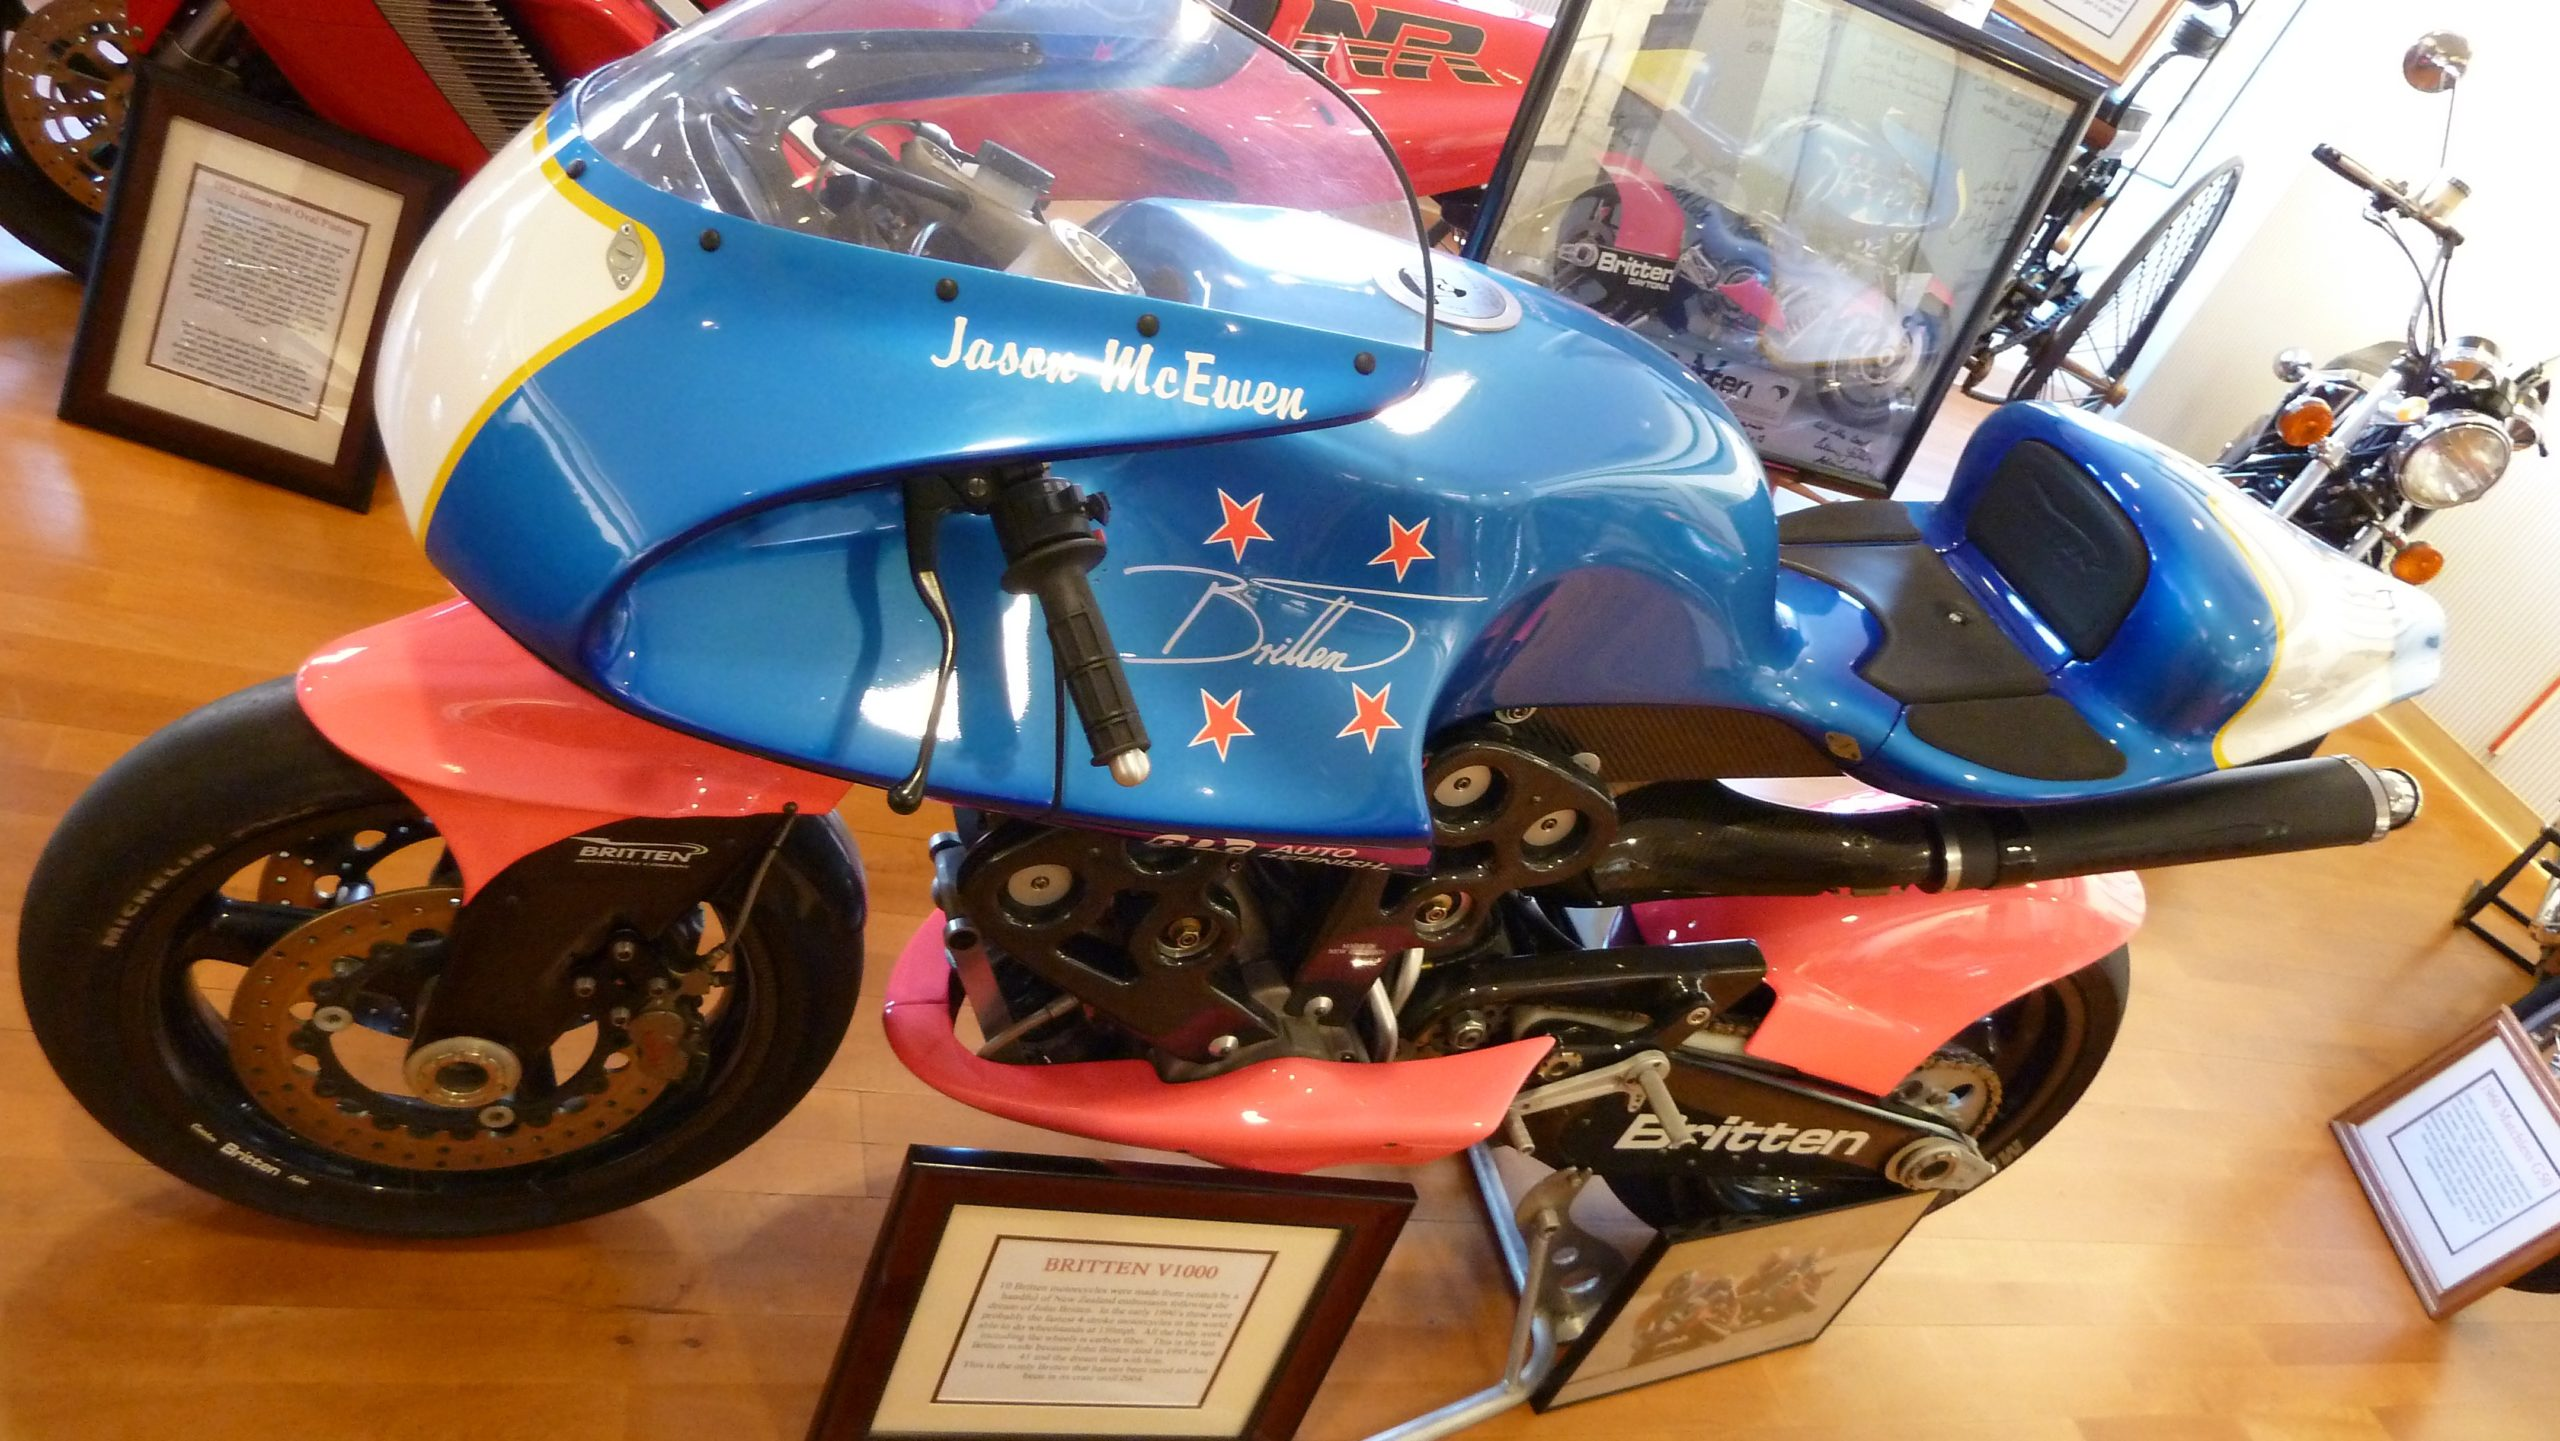 Britten V1000 - The Kiwi Brewed Champion 6